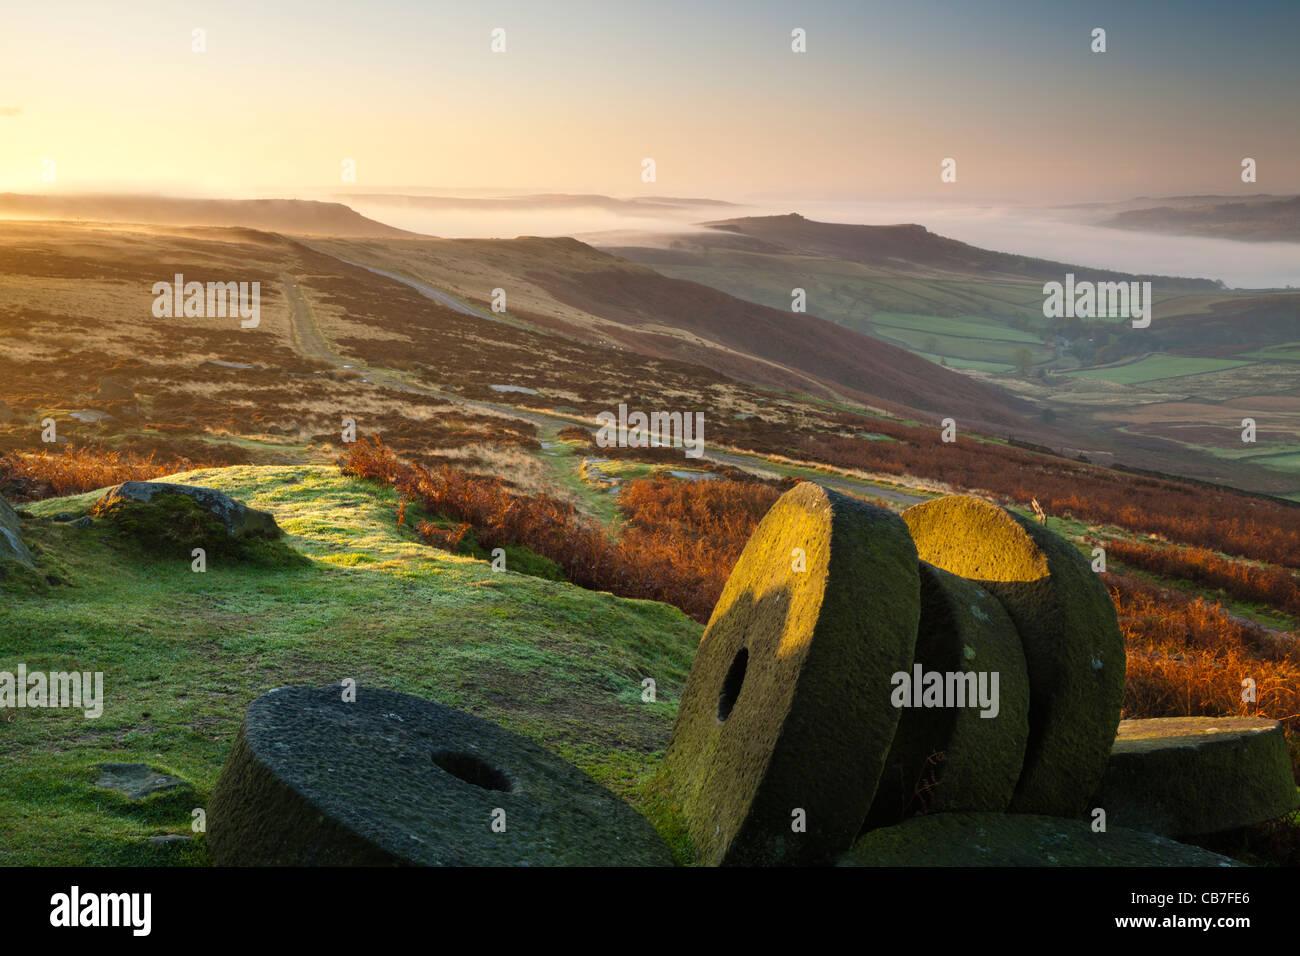 Borde Stanage Sunrise, muelas, Peak District National Park, Derbyshire, Inglaterra, Reino Unido. Imagen De Stock